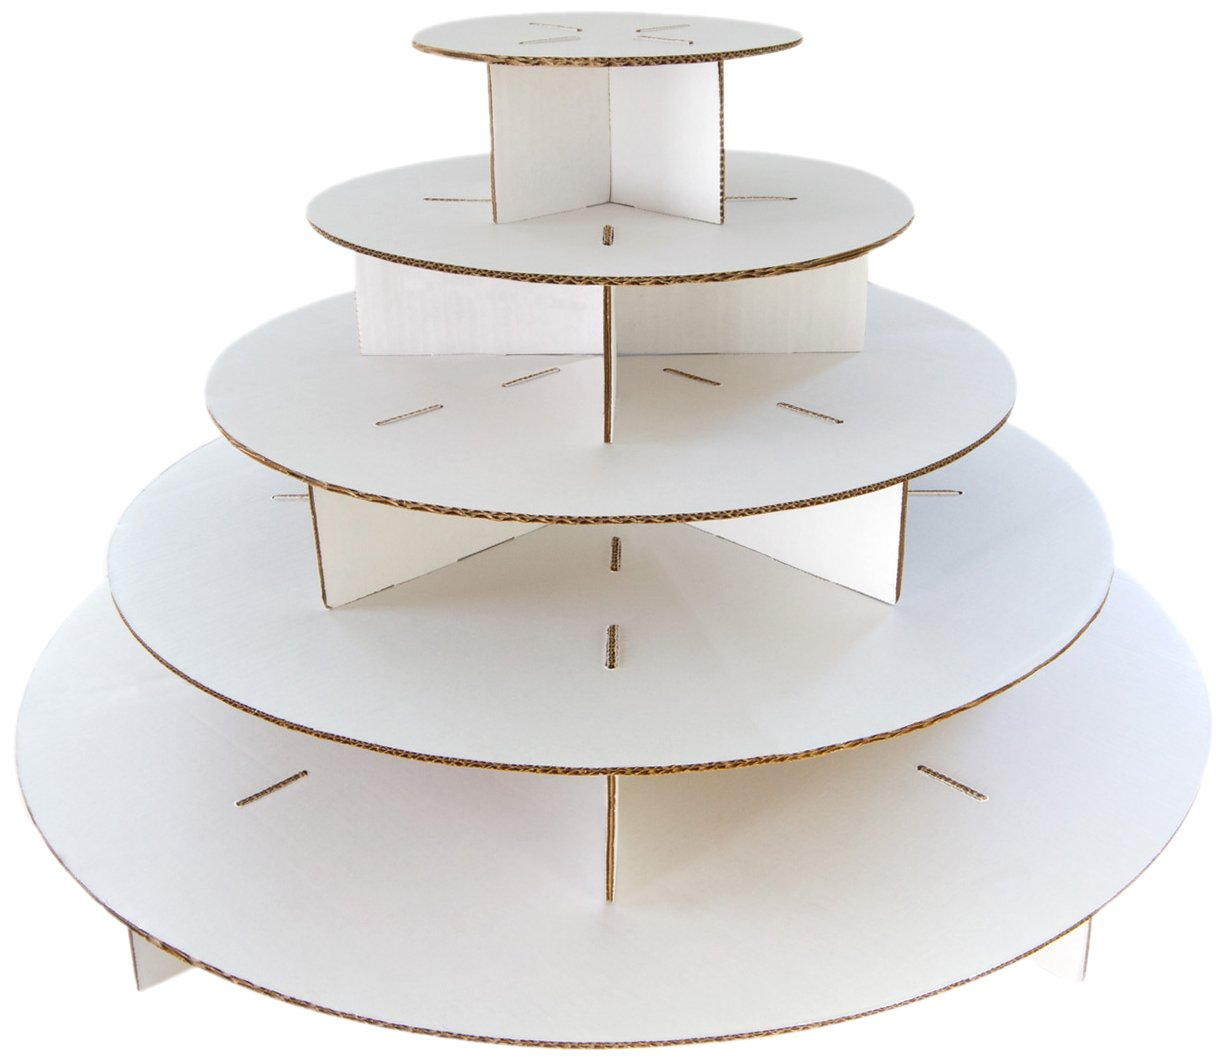 Tier Cardboard Cake Stand